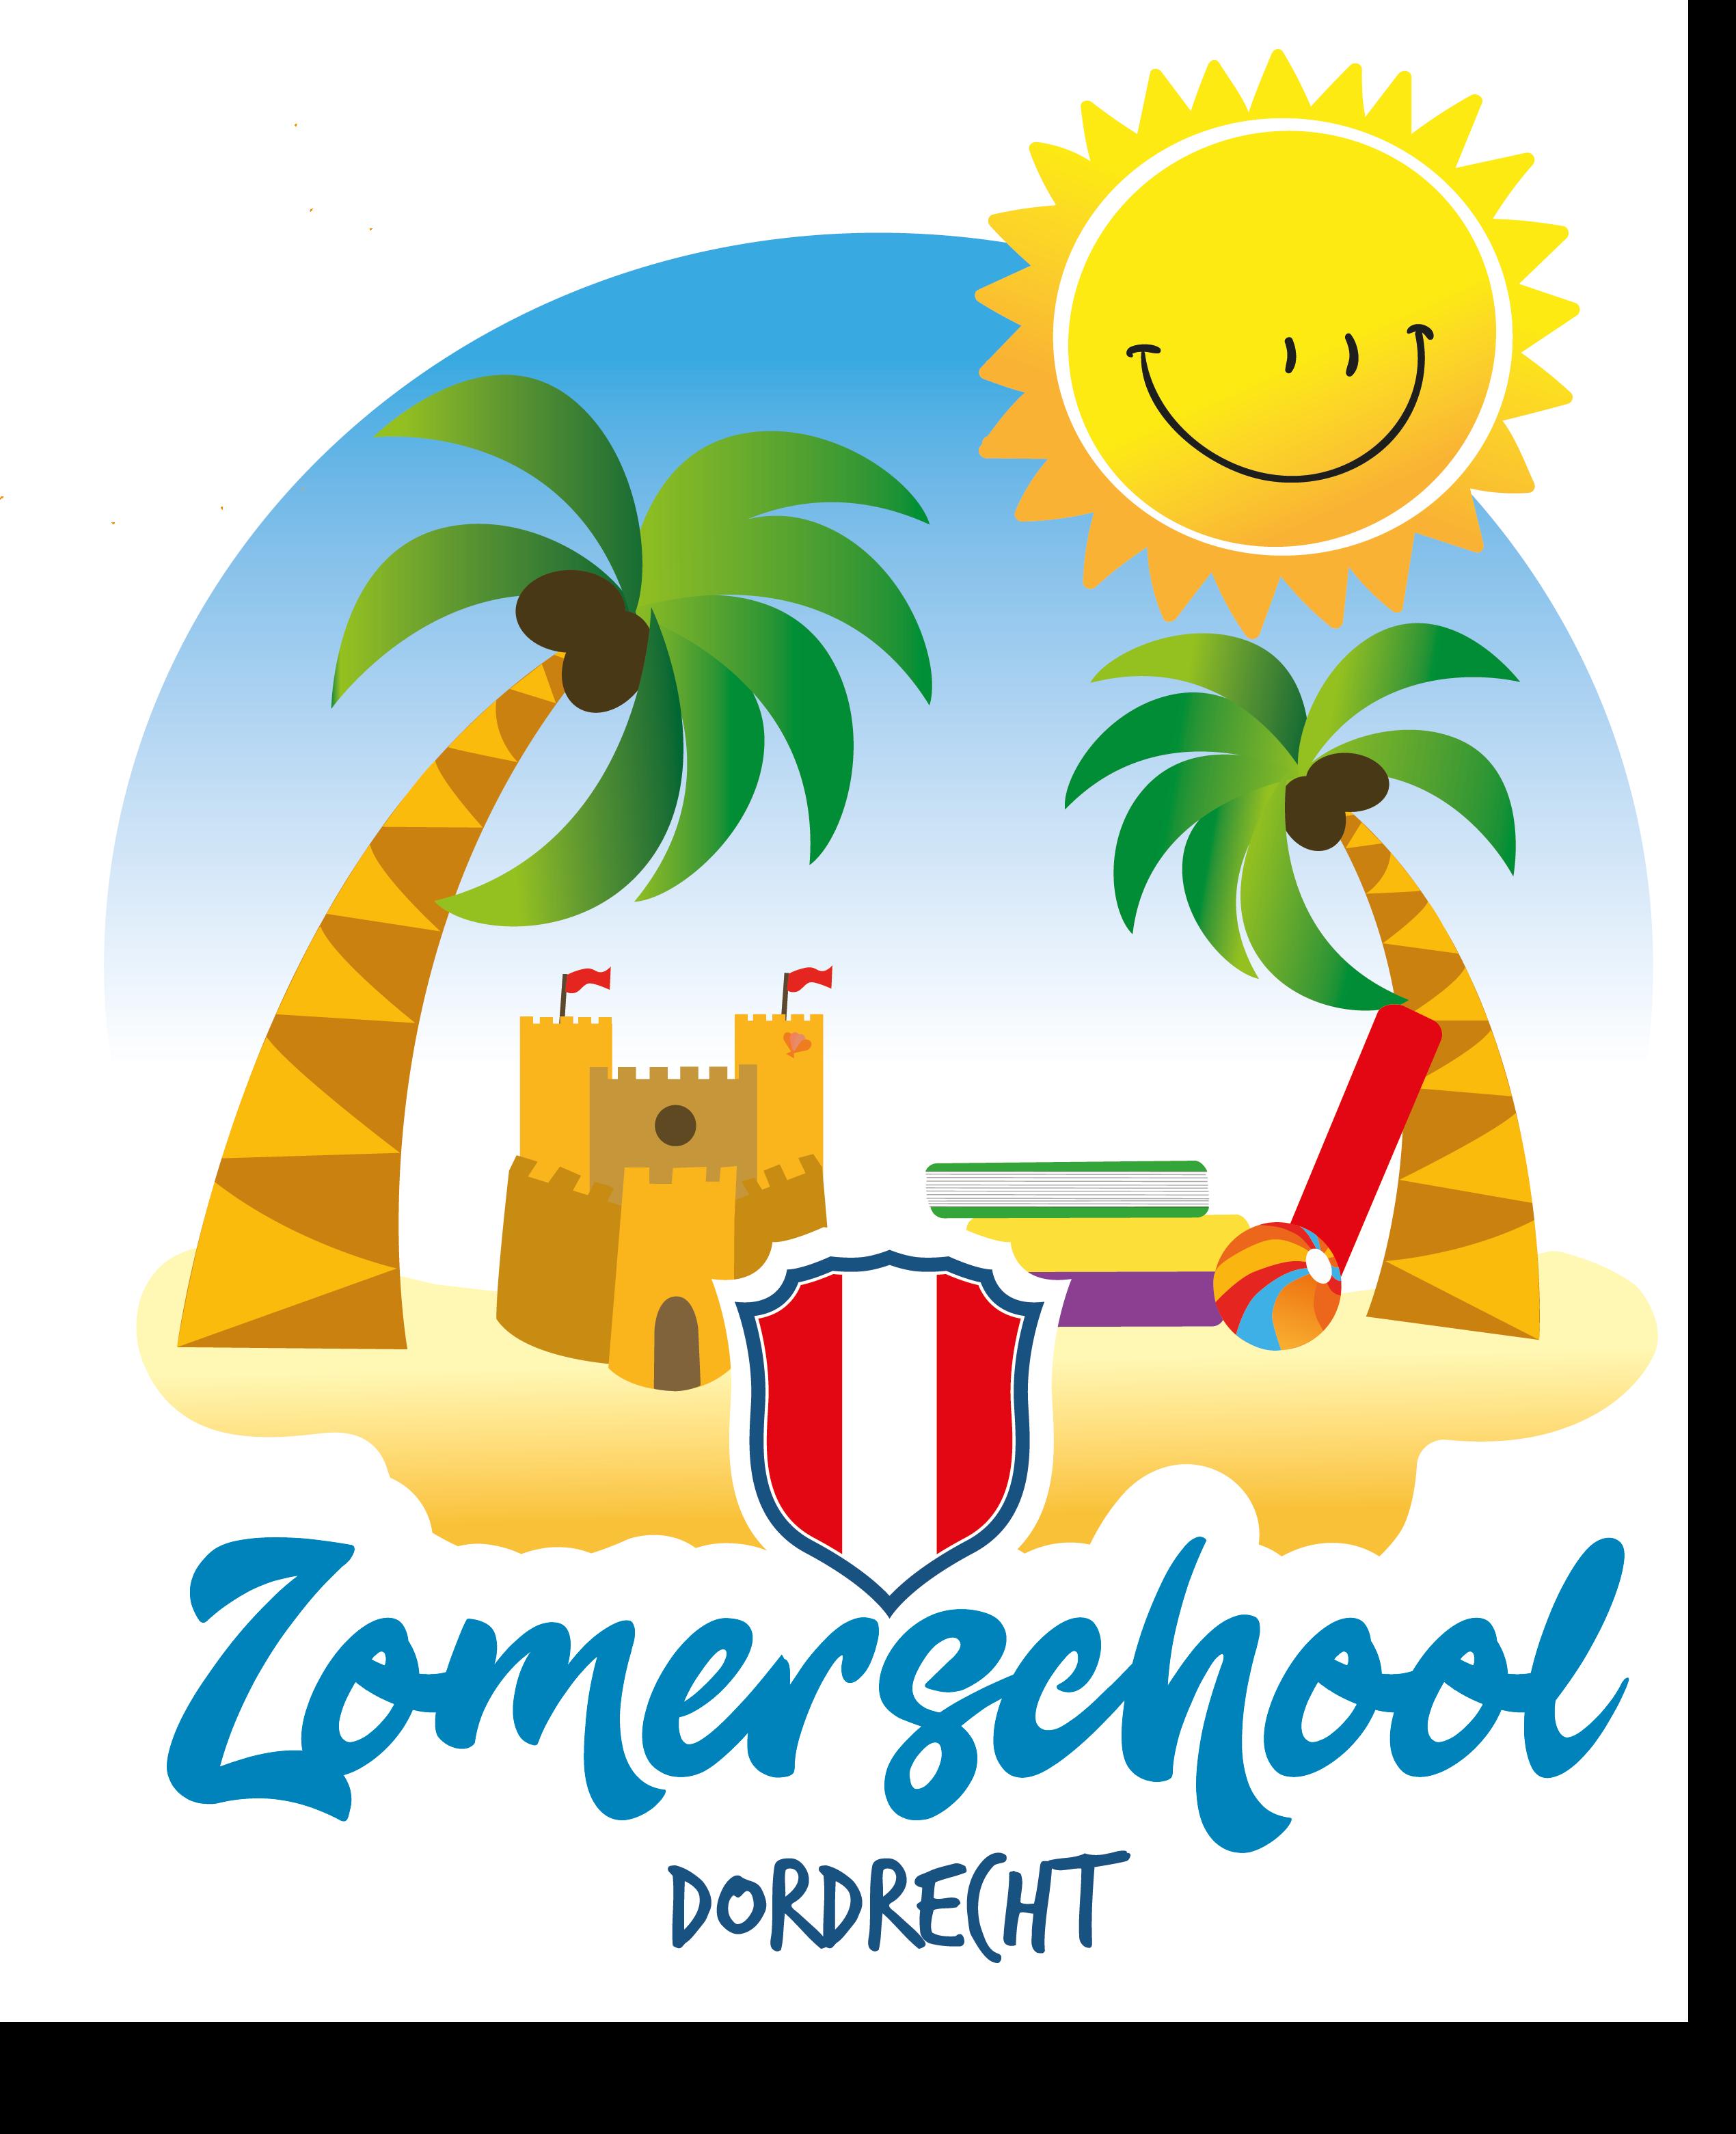 Zomerschool logo 2018.png